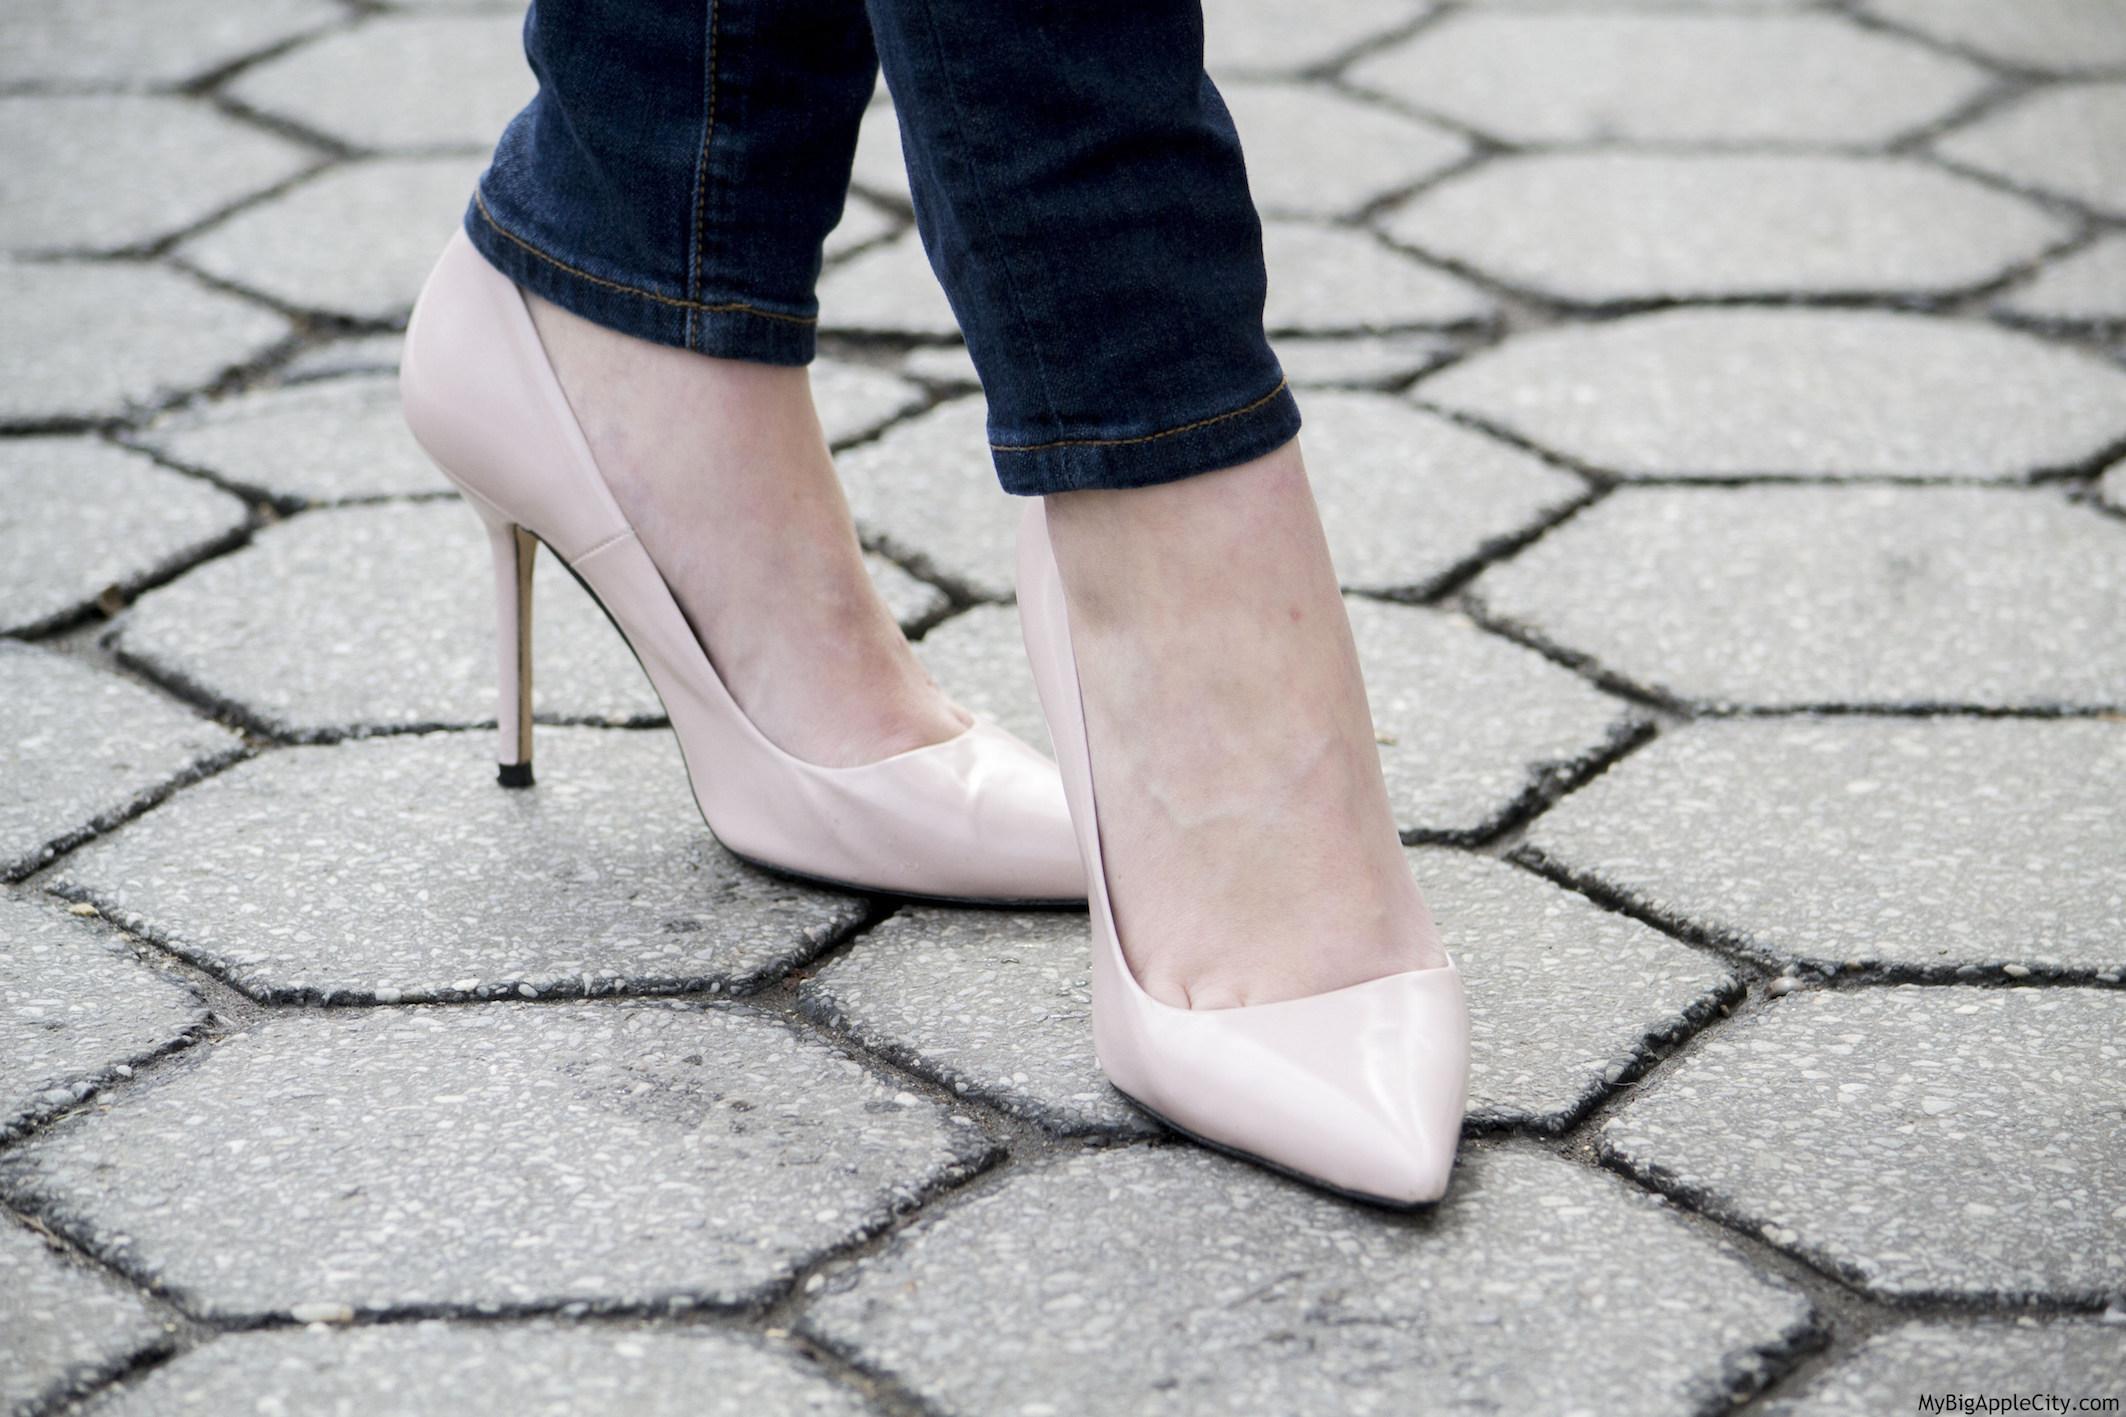 Zara-pumps-fashion-blog-ootd-streetstyle-newyork